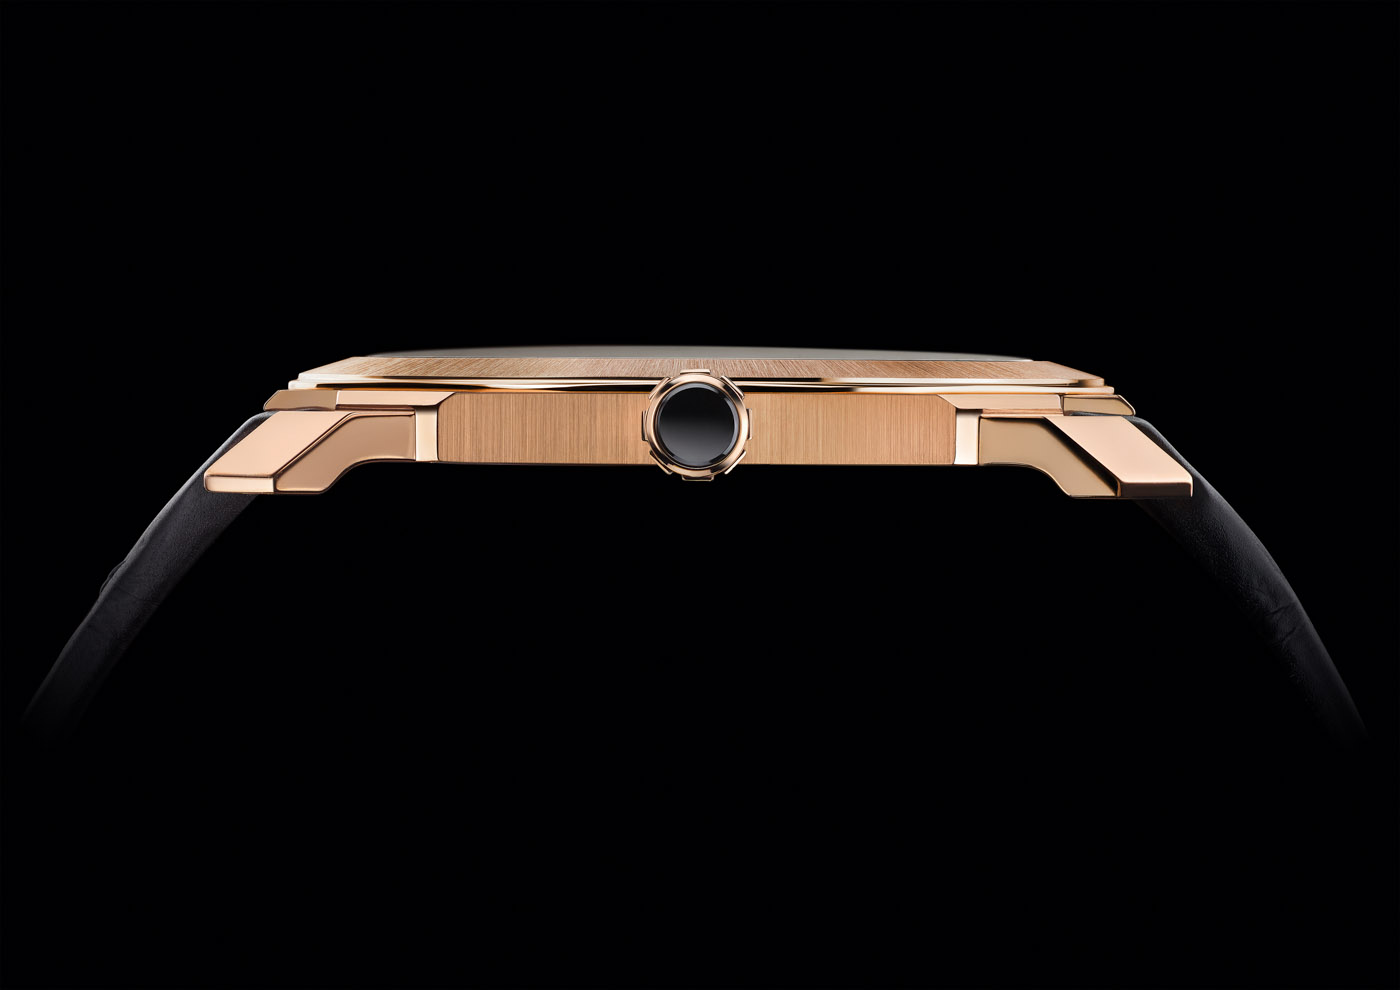 BVLGARI OCTO FINISSIMO AUTOMATIC SATIN-POLISHED ROSE GOLD 103286